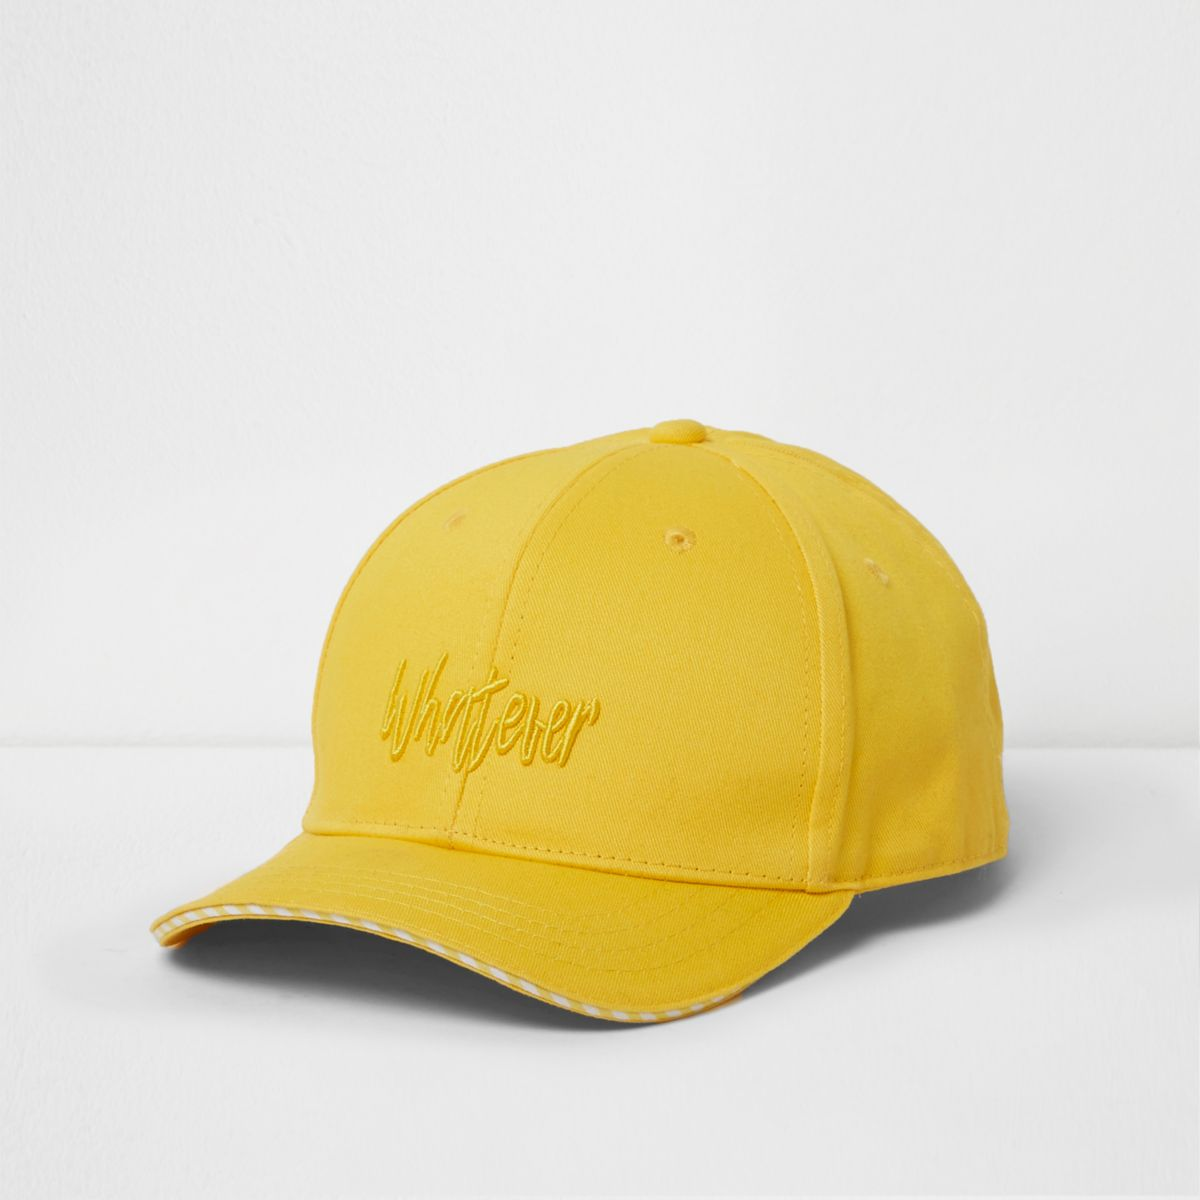 Casquette de baseball «whatever» jaune pour garçon